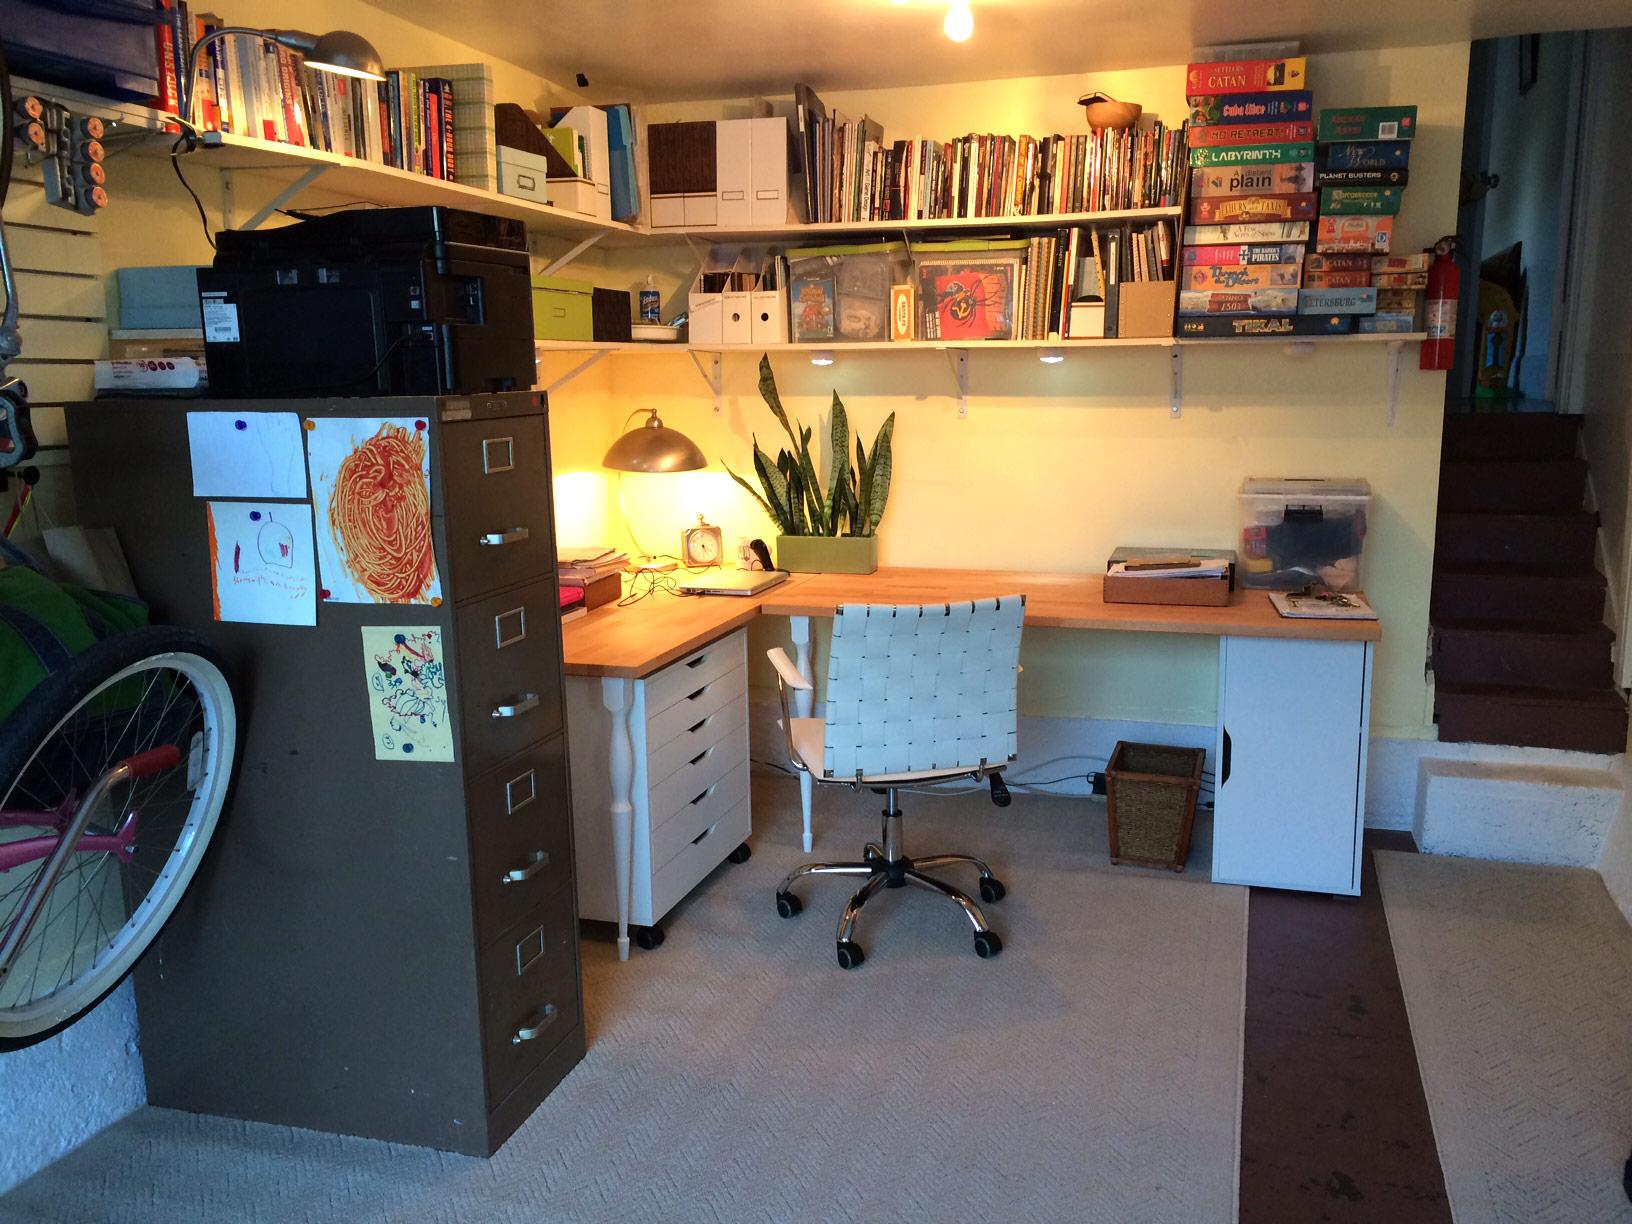 Garage office - After